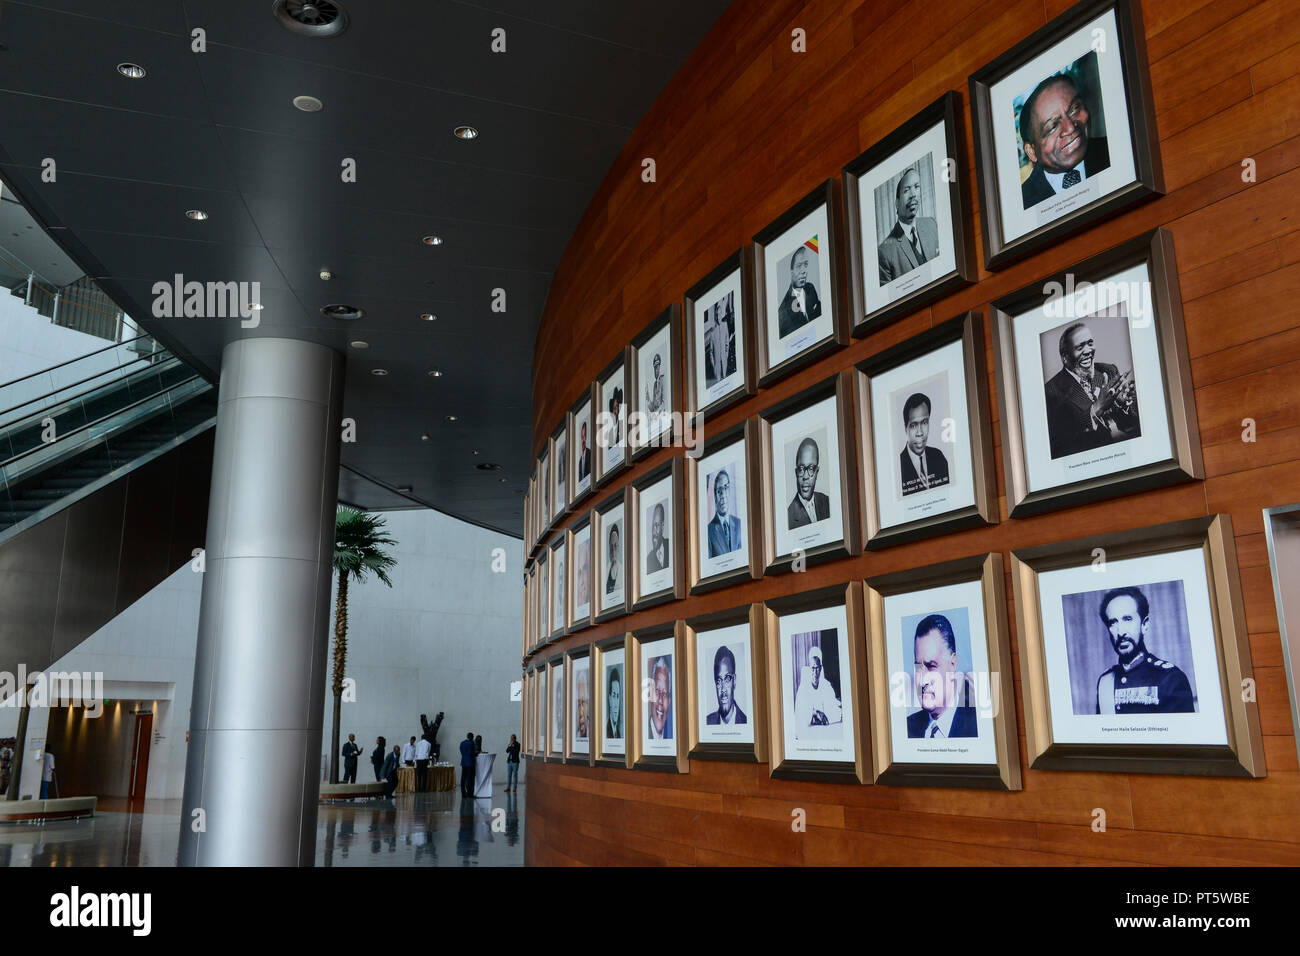 ETHIOPIA Addis Ababa, AU African Union building, wall with photos of african presidents and PM ie Haile Selassie, Nelson Mandela, Salvar Kiir Mayardit, Patrice Lumumba, Robert Mugabe / AETHIOPIEN, Addis Abeba, Gebaeude der AU Afrikanischen Union, Foyer mit Fotos afrikanischer Praesidenten und Premierminister - Stock Image